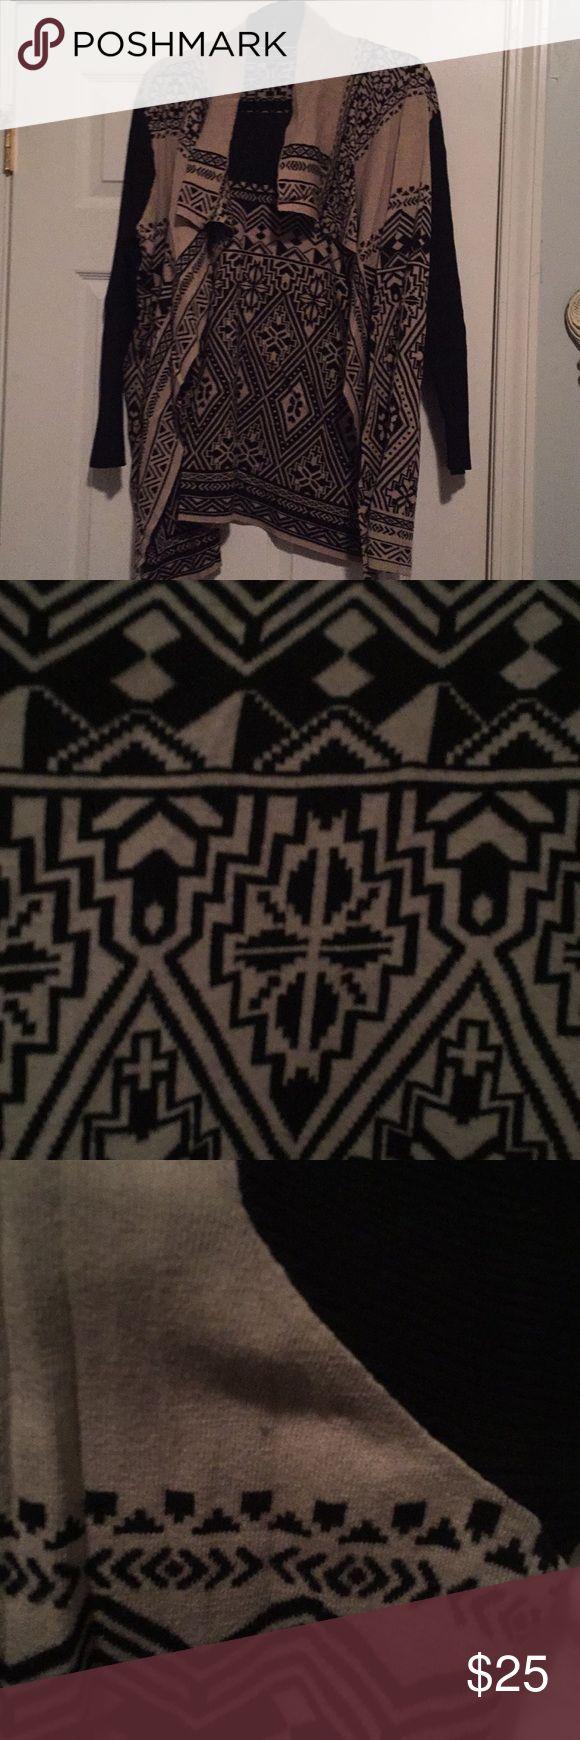 VGUC Lucky Brand 2X Aztec print cardigan VGUC Lucky Brand 2X Aztec print cardigan Lucky Brand Sweaters Cardigans